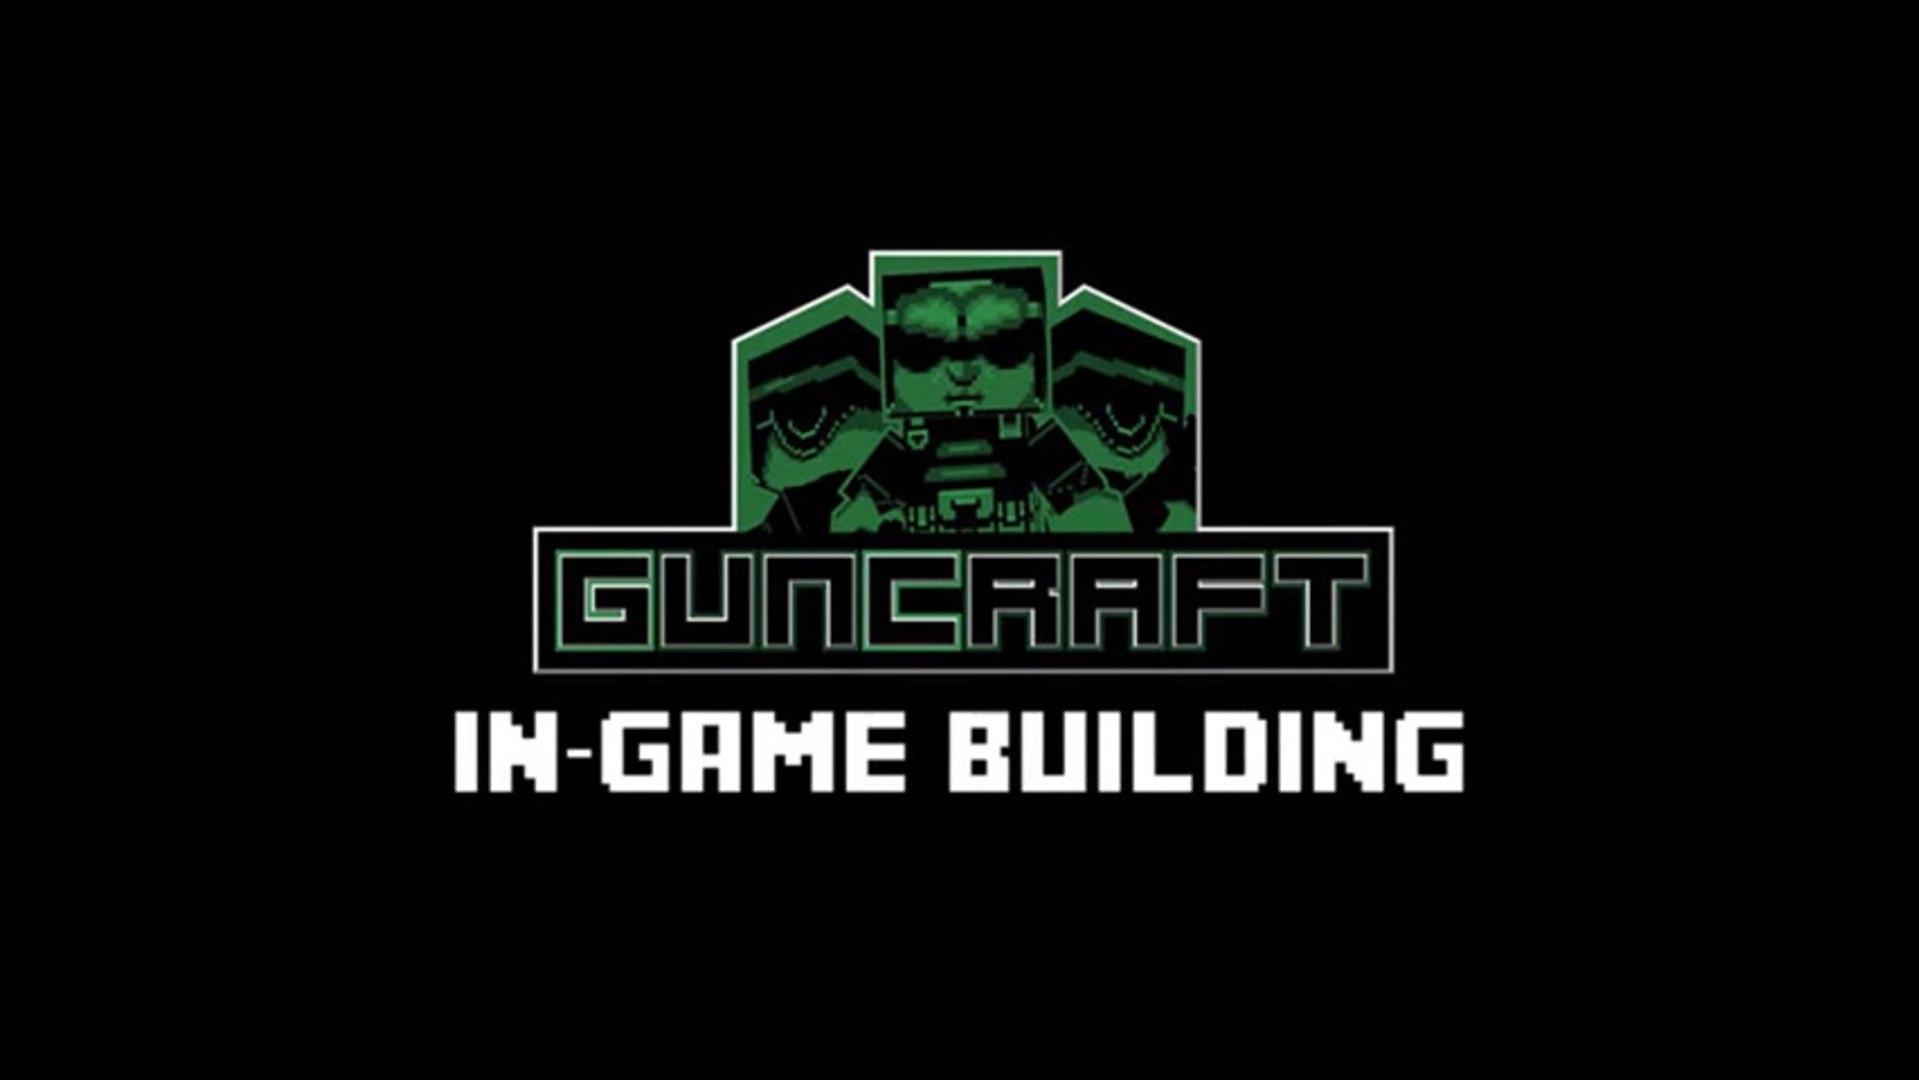 Guncraft - An in-game building Trailer